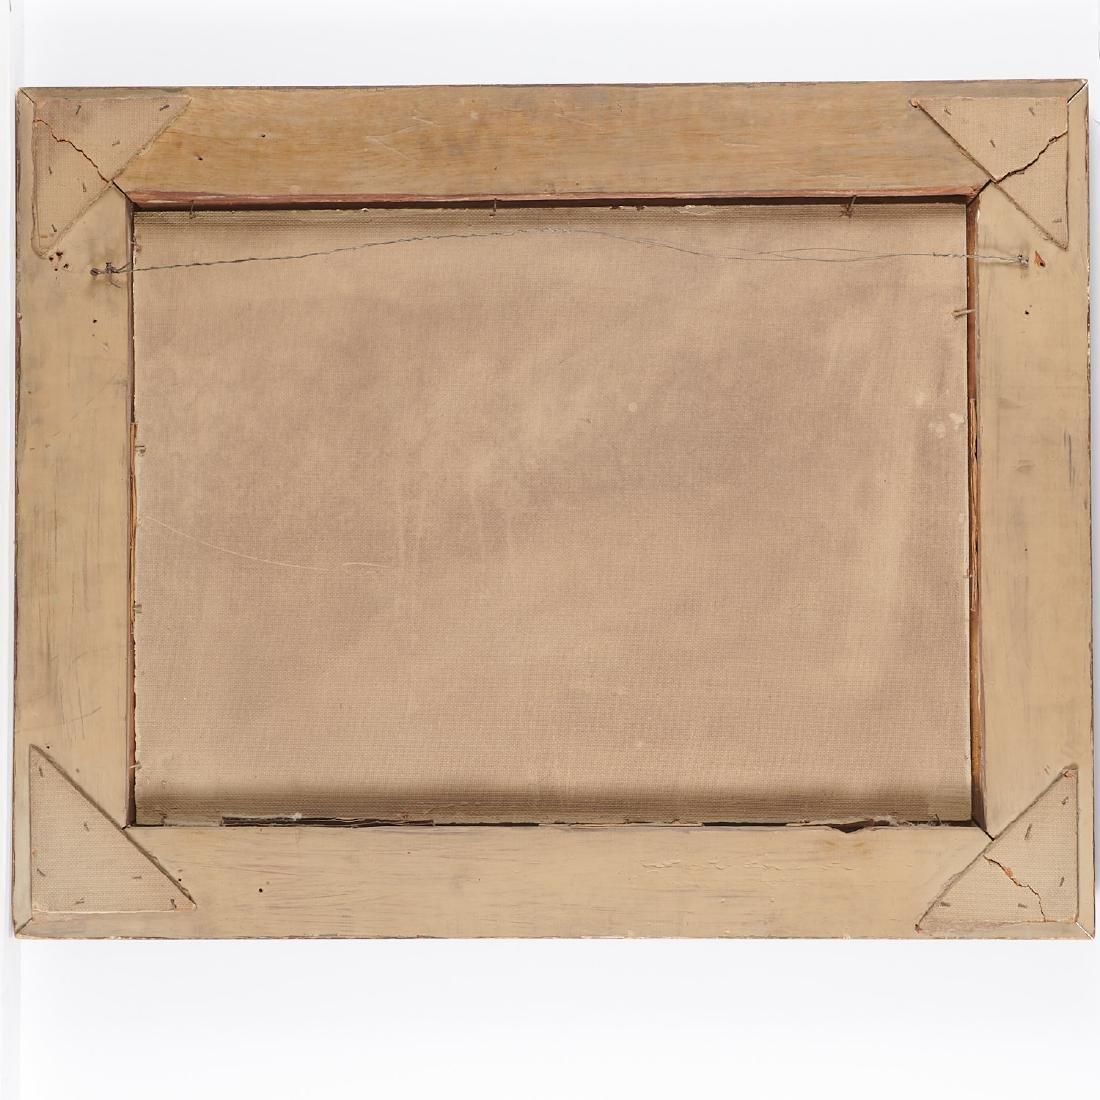 Aaron Bohrod, painting - 7